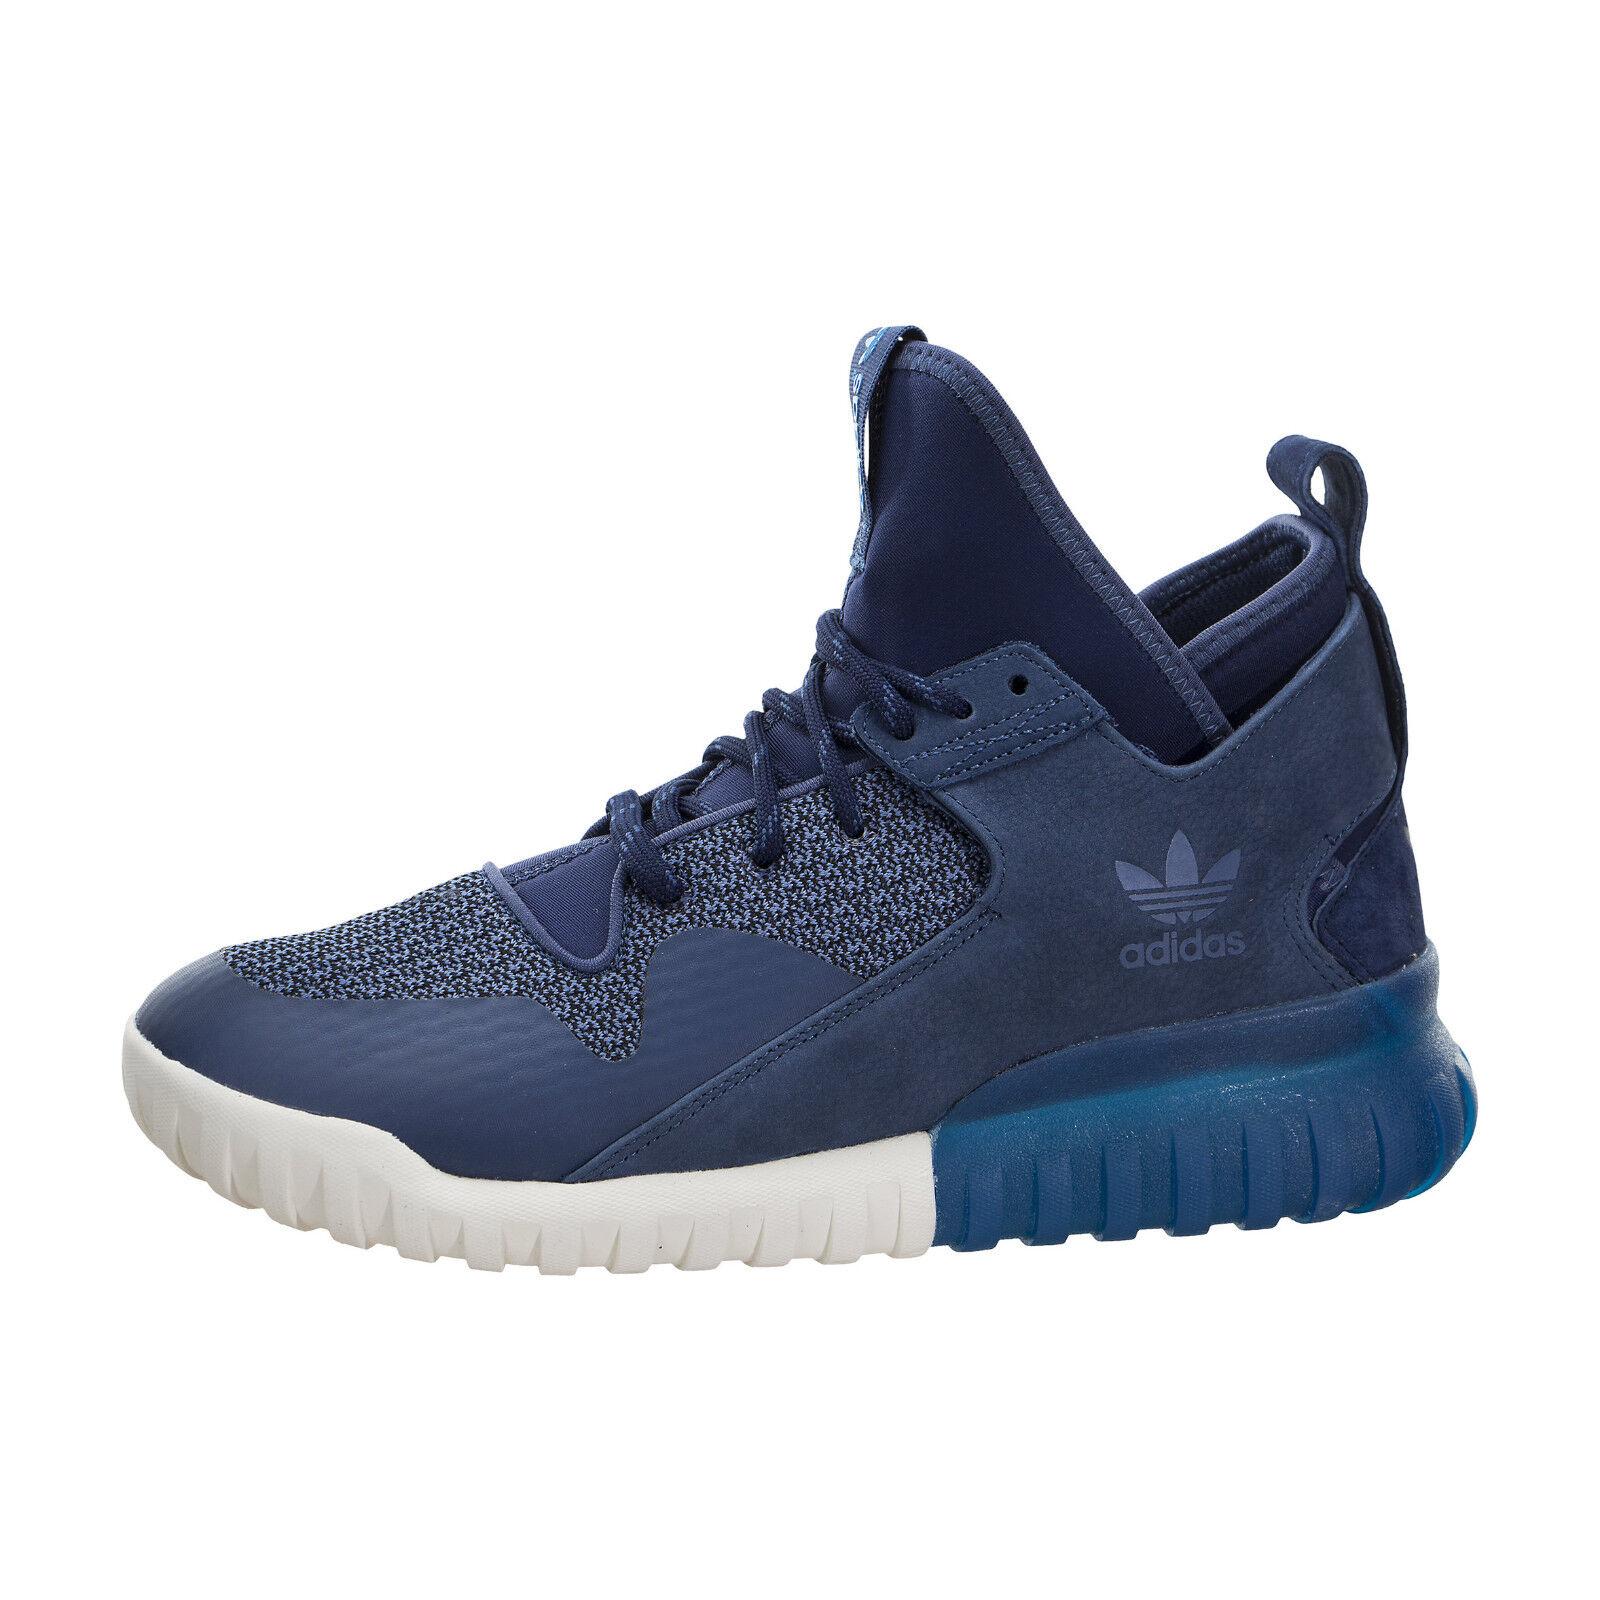 adidas Originals Tubular X Herrenschuhe Sneaker Turnschuhe Primeknit S74926